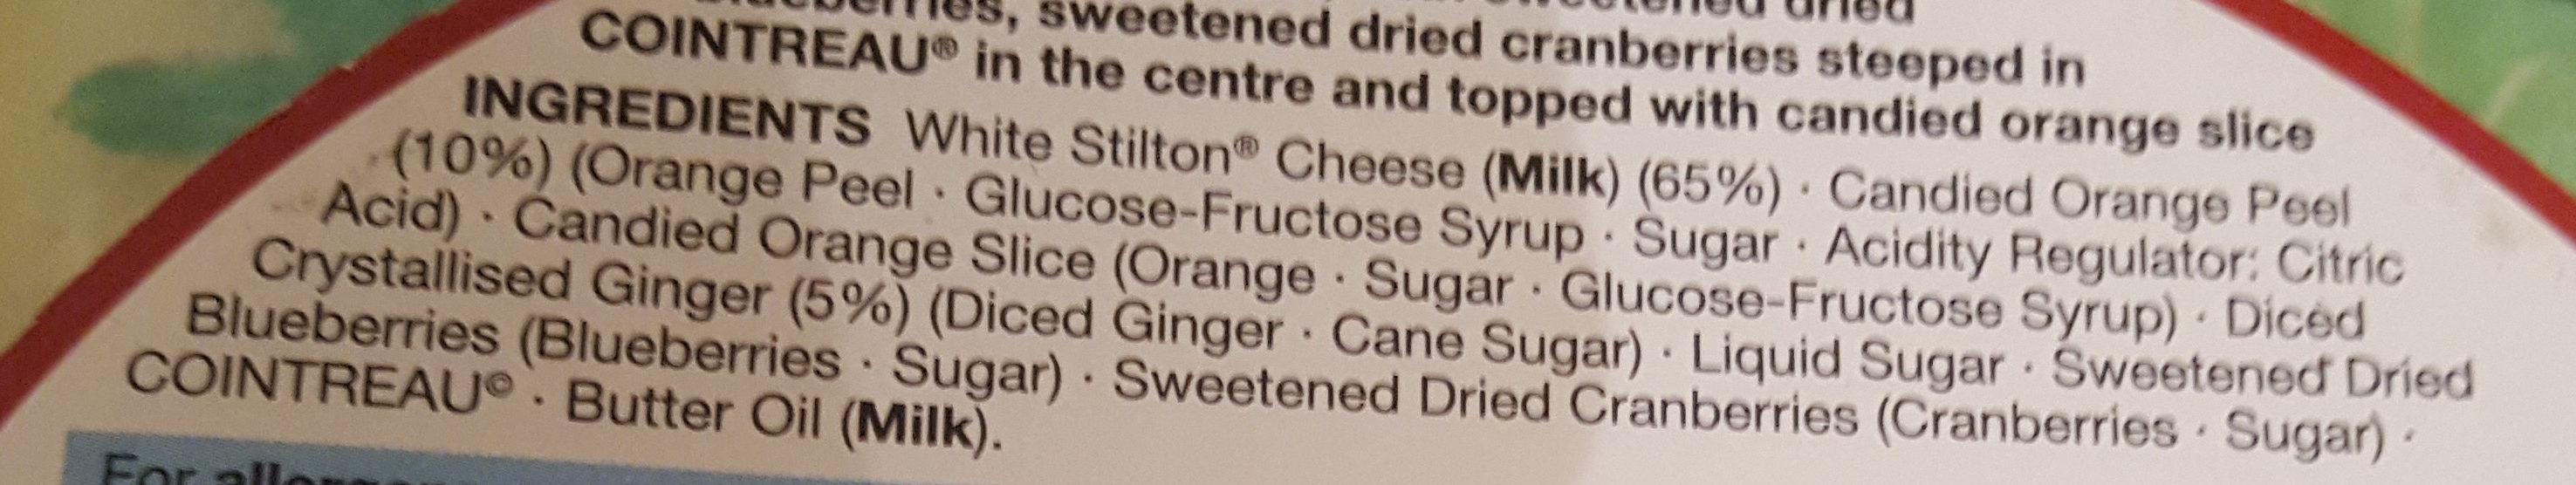 white stilton - Ingredients - en